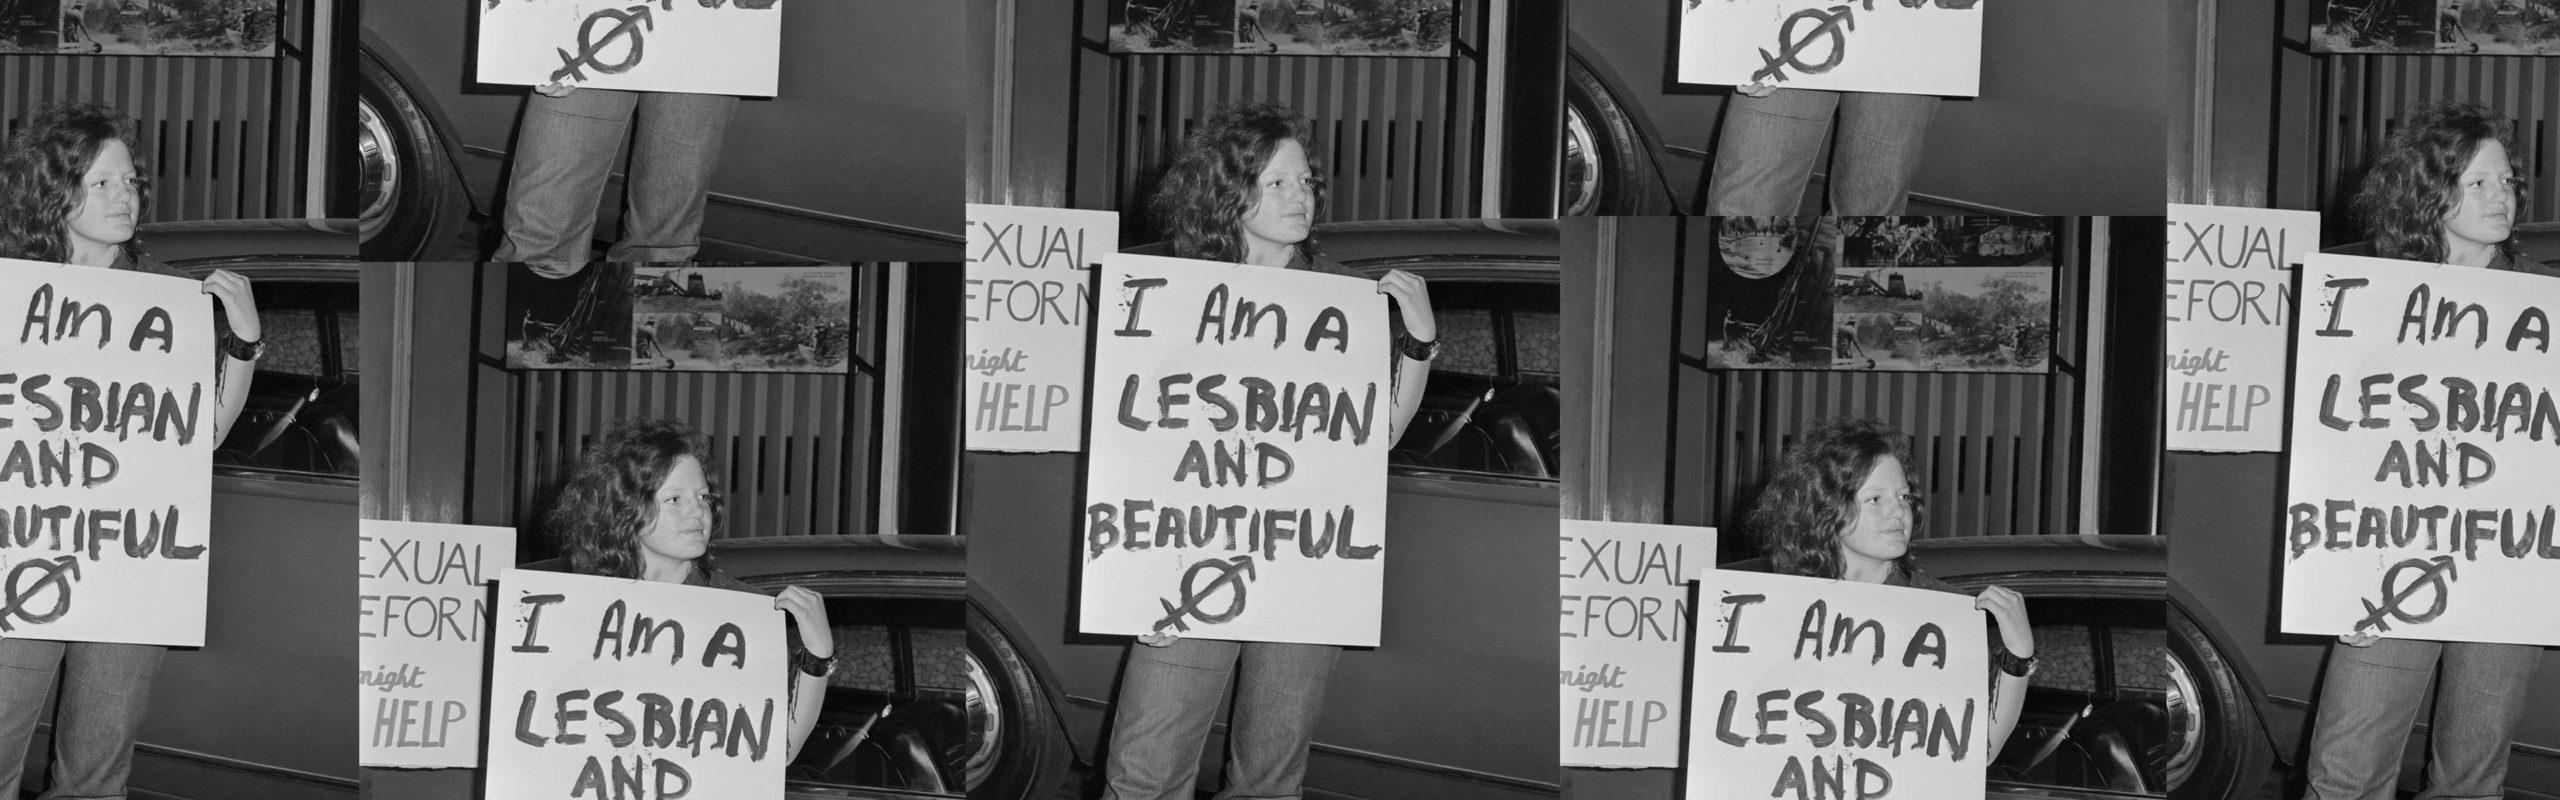 australian-gay-lesbian-archives-banner-5